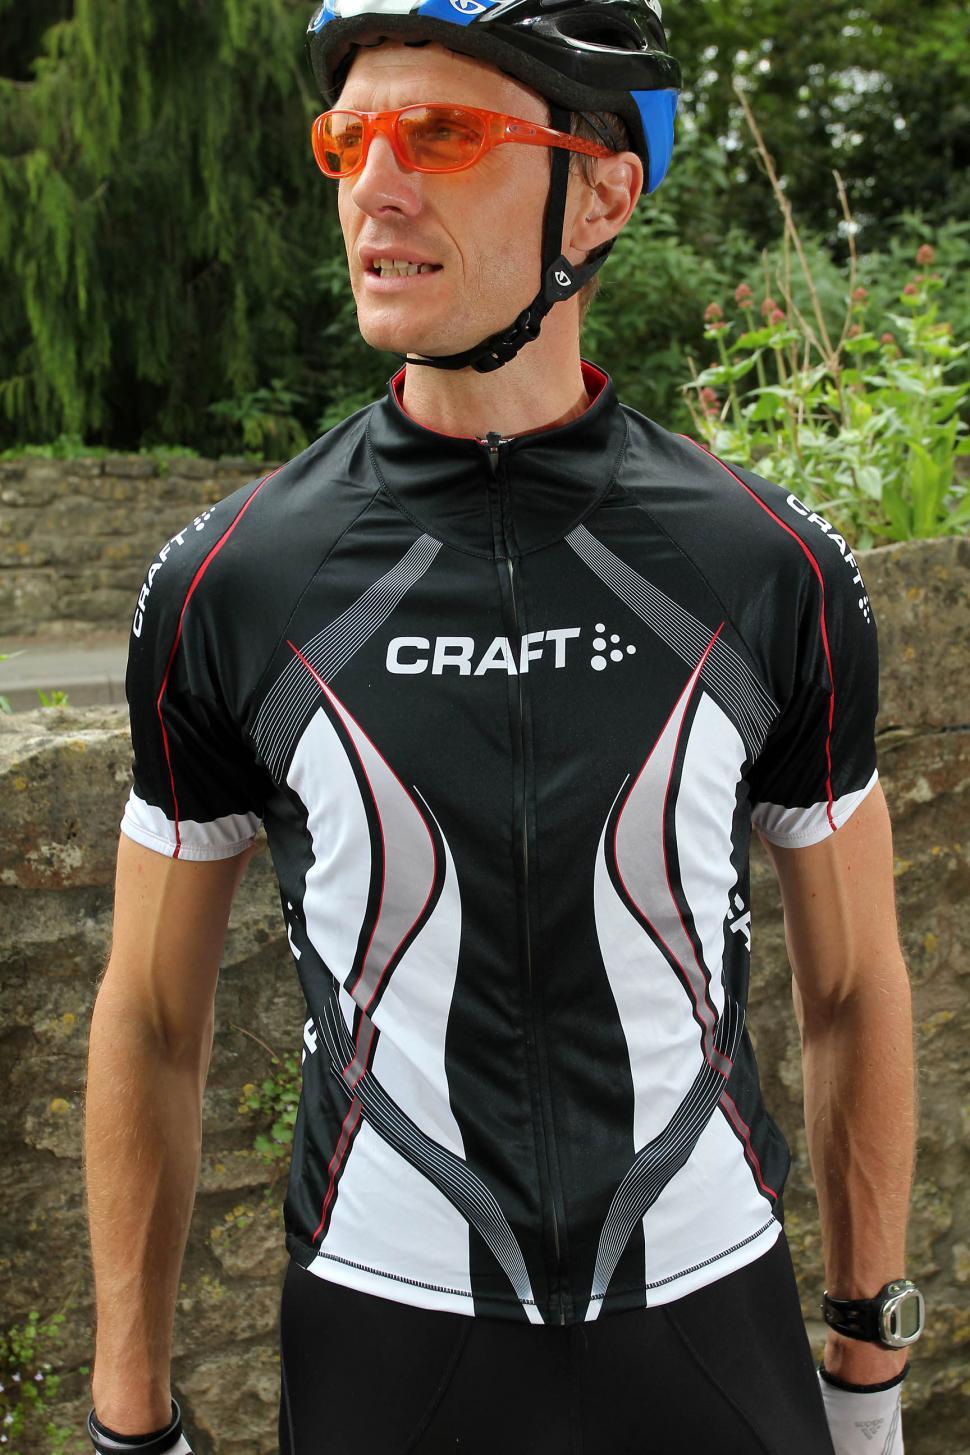 Craft Performance Tour jersey